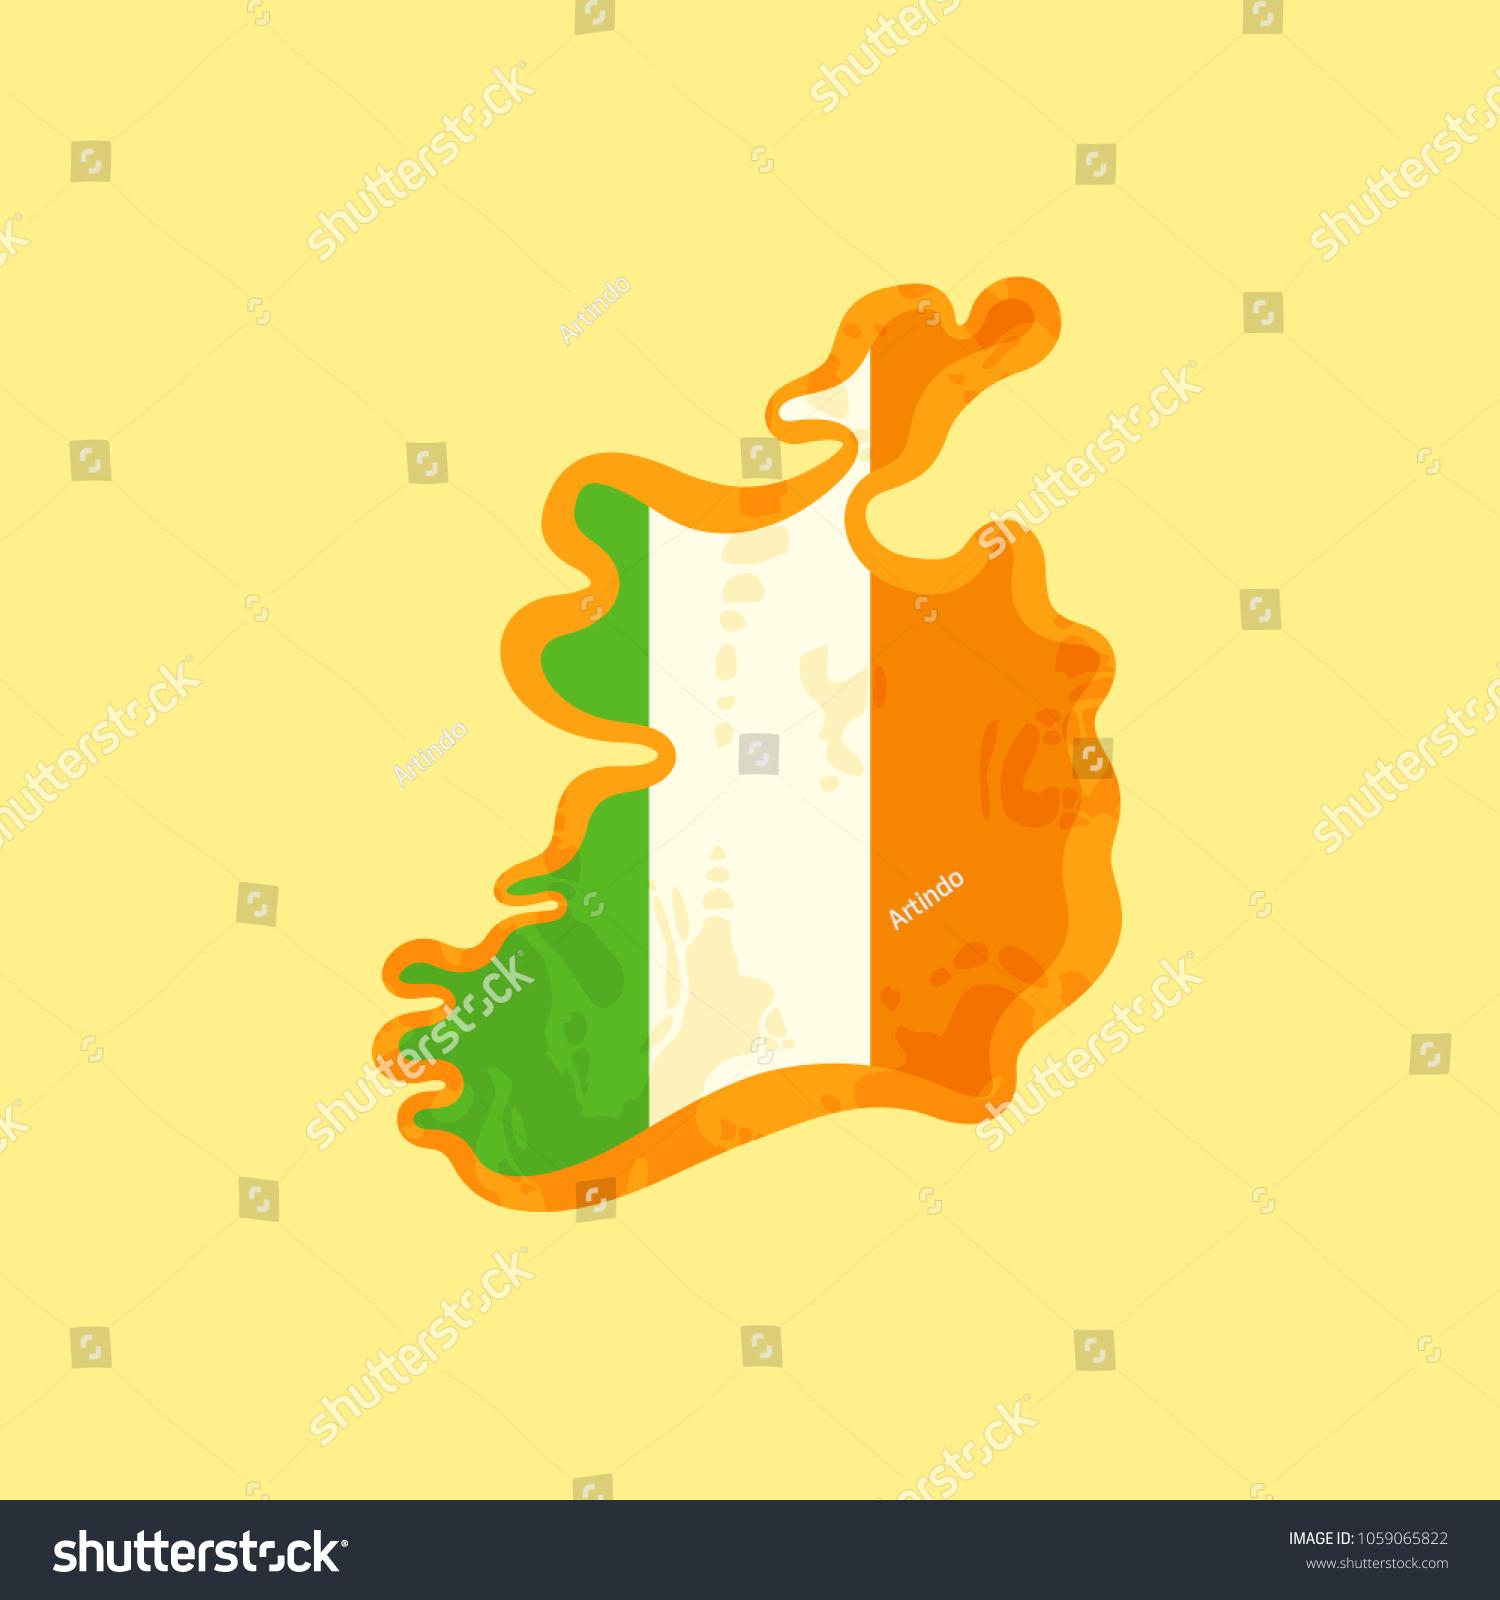 Map Of Ireland In Irish.Map Ireland Colored Irish Flag Marked Stock Vector Royalty Free